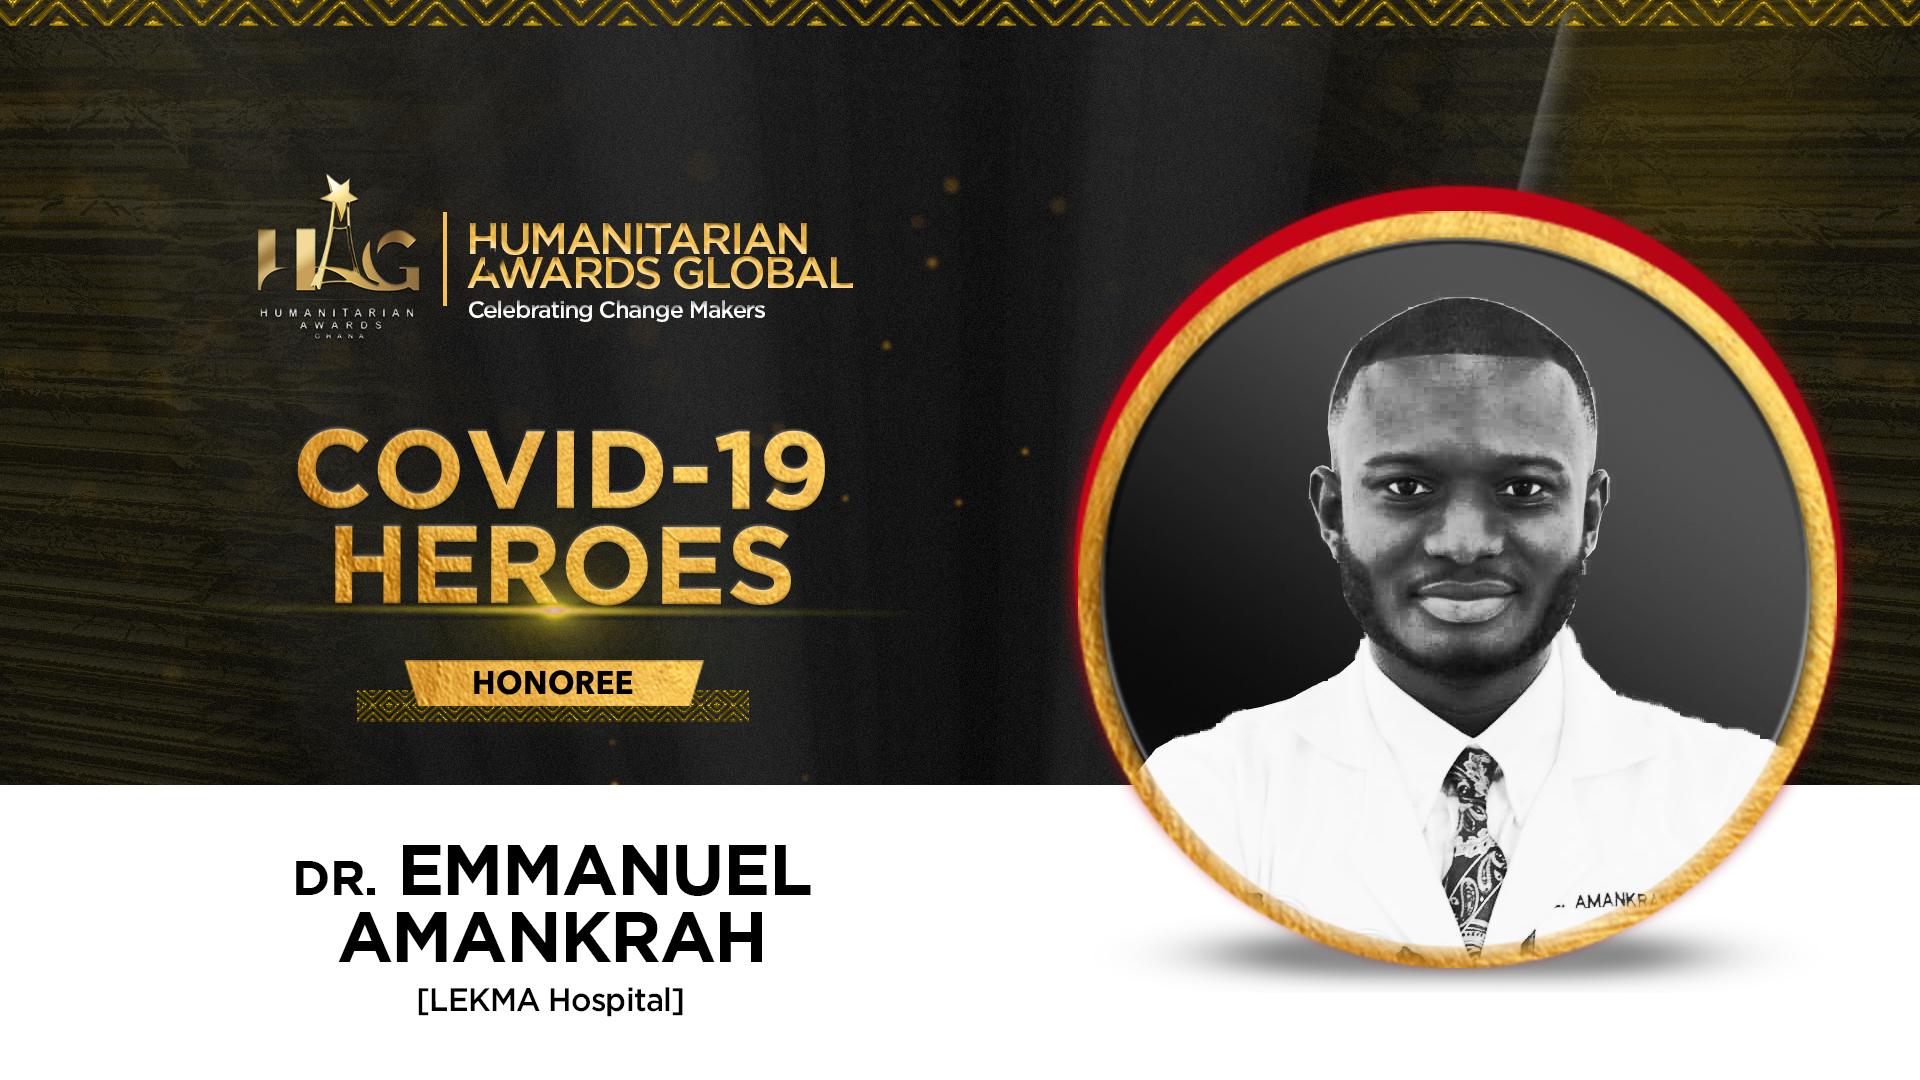 Dr Emmanuel Amankrah of LEKMA Hospital  to be honoured by Humanitarian Awards Global